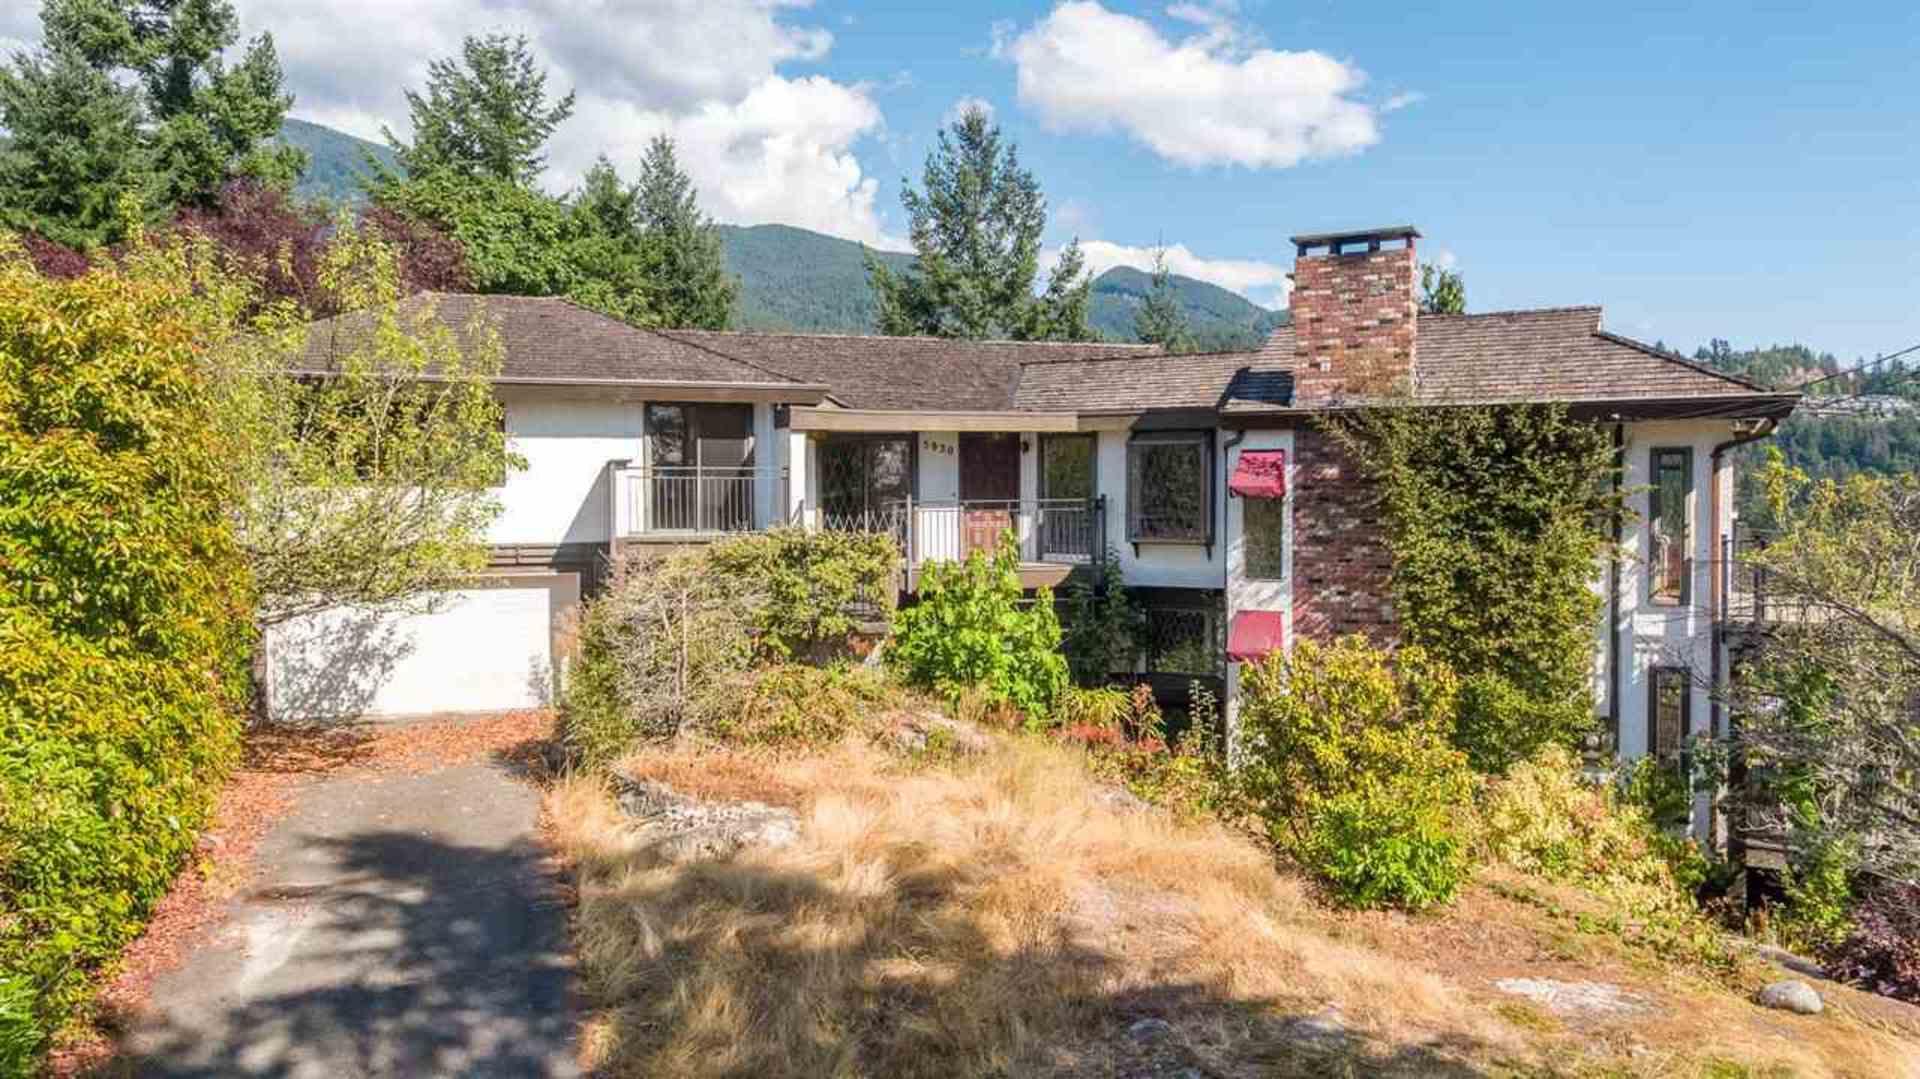 5930-condor-place-eagleridge-west-vancouver-02 at 5930 Condor Place, Eagleridge, West Vancouver